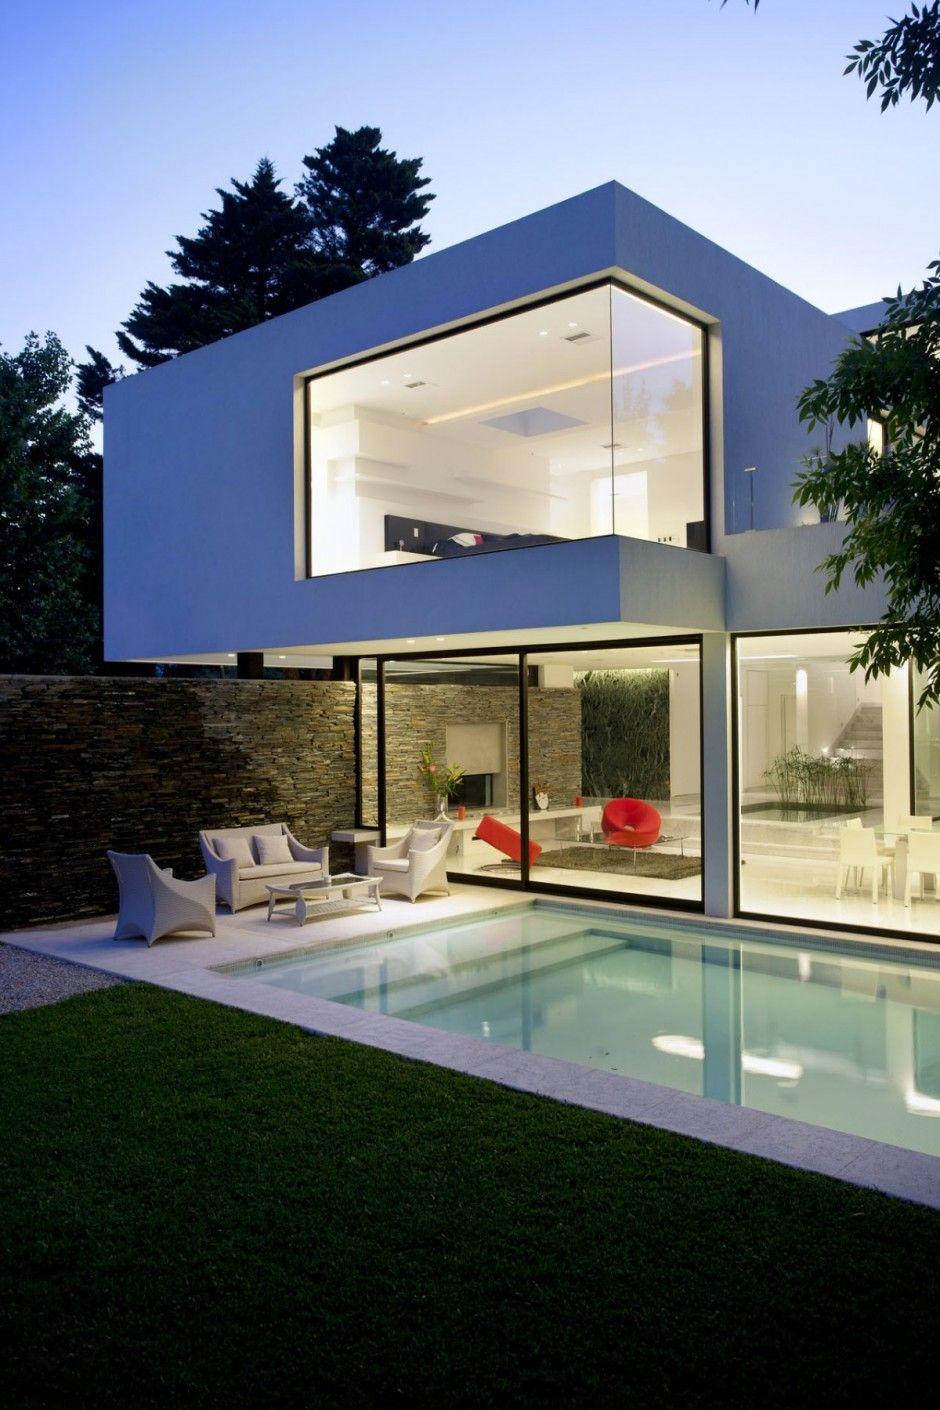 Carrara house by andres remy arquitectos i arquitectura for Casa minimalista un nivel